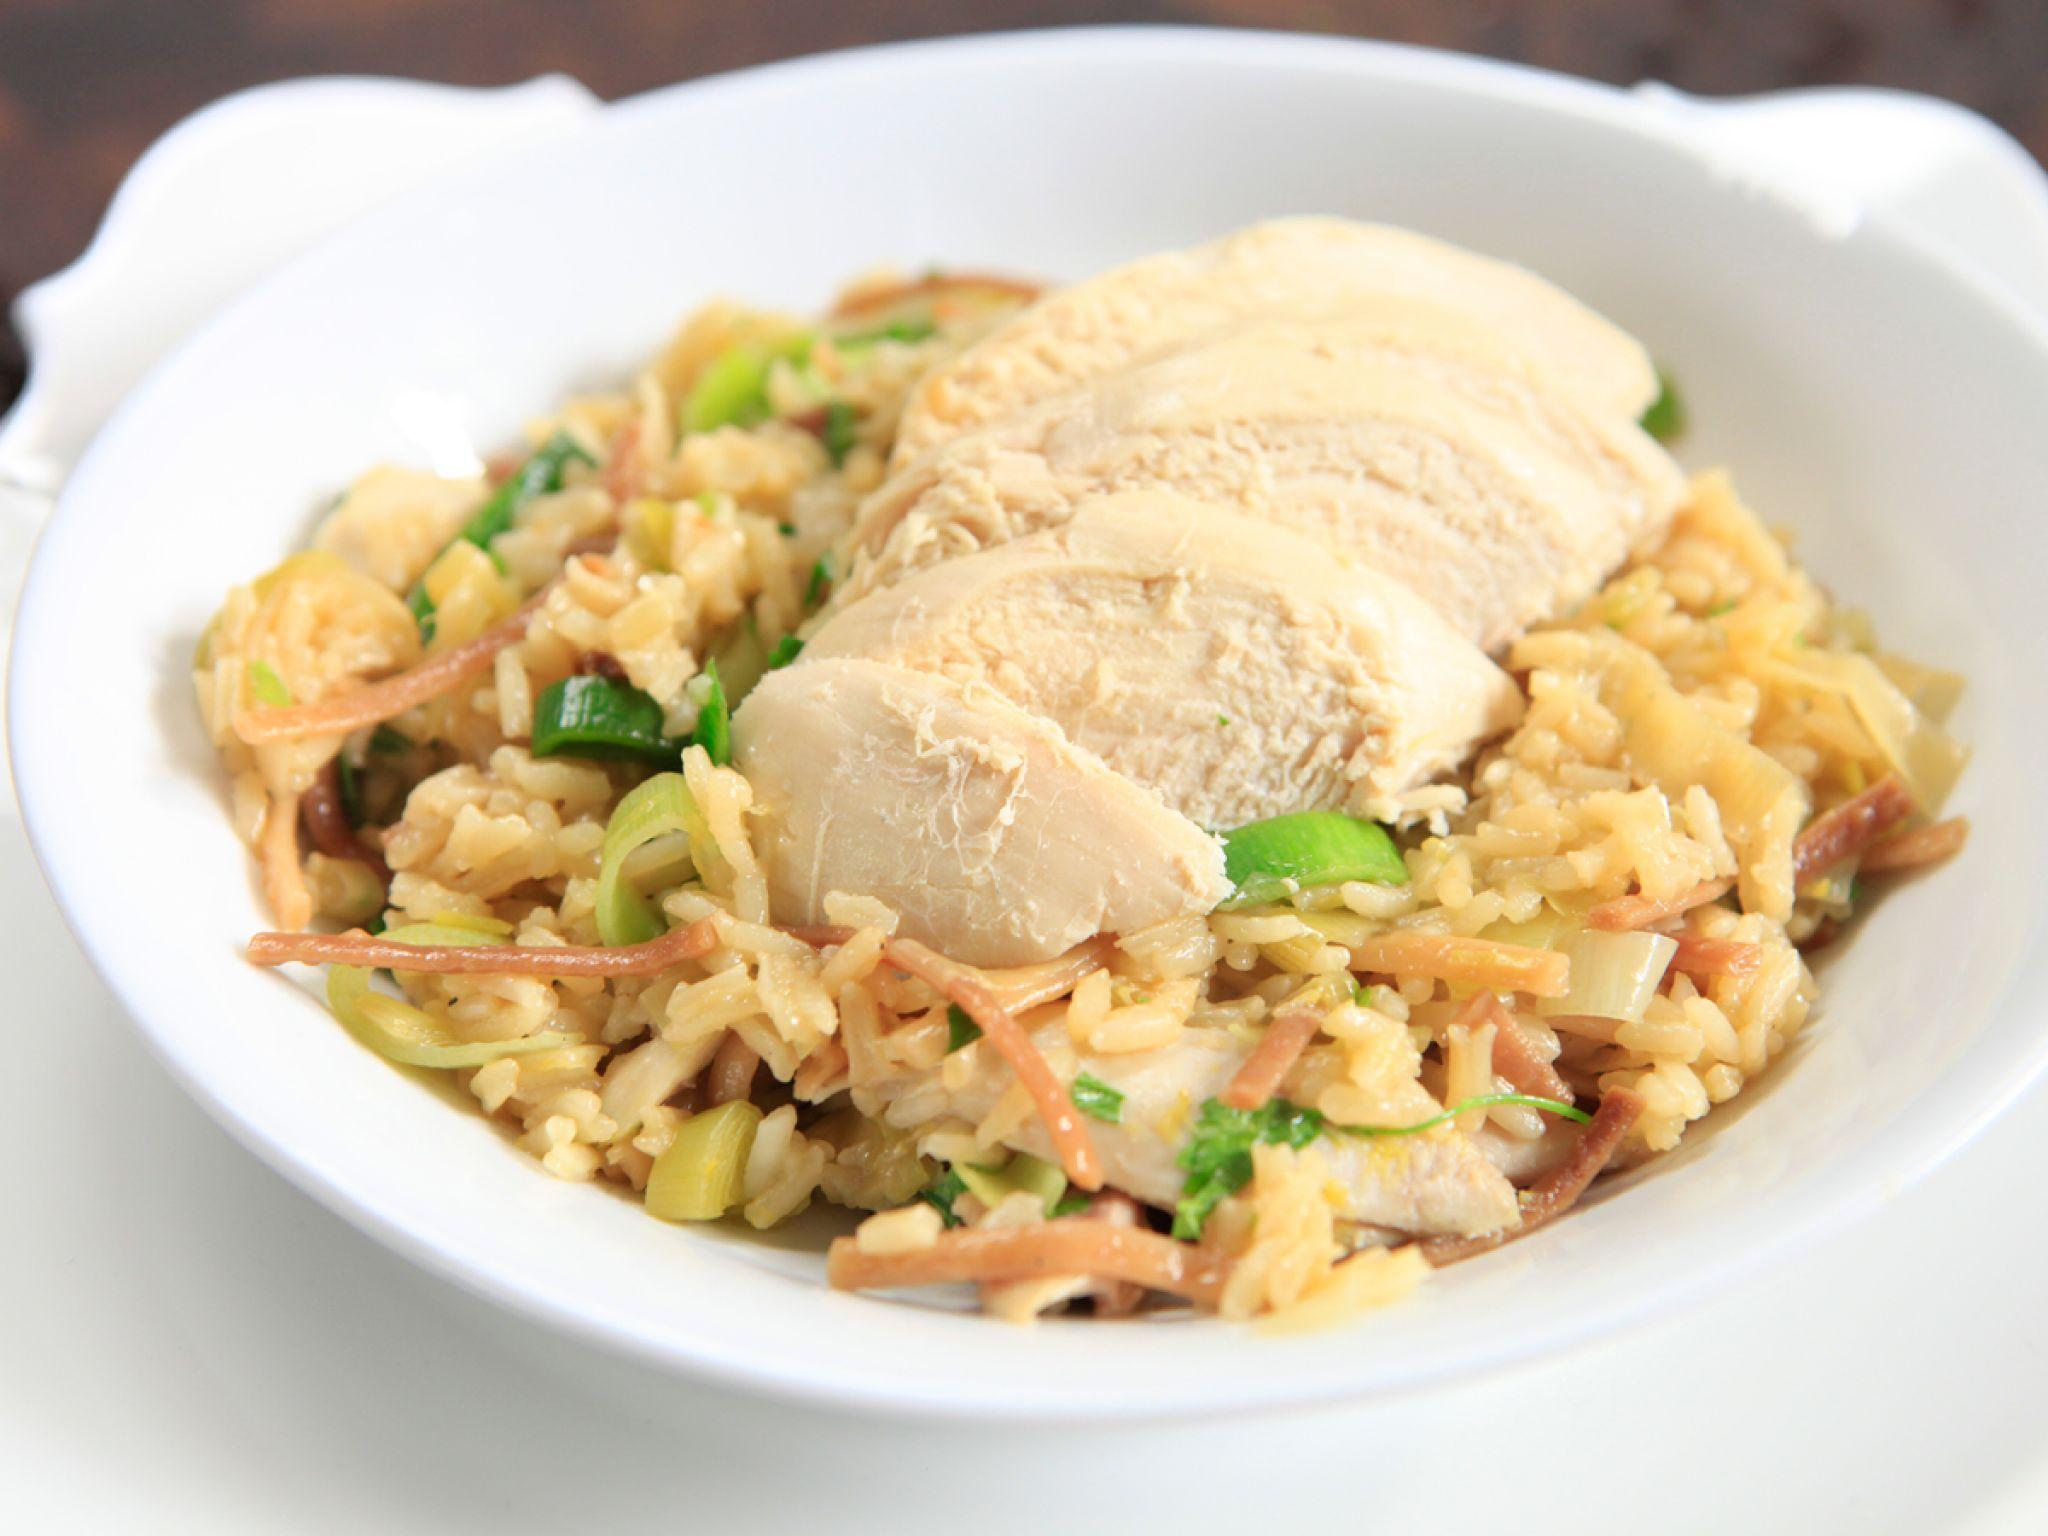 Lemon chicken and leek rice pilaf recipe rice pilaf recipe lemon chicken and leek rice pilaf recipe rice pilaf recipe lemon chicken and rice forumfinder Images